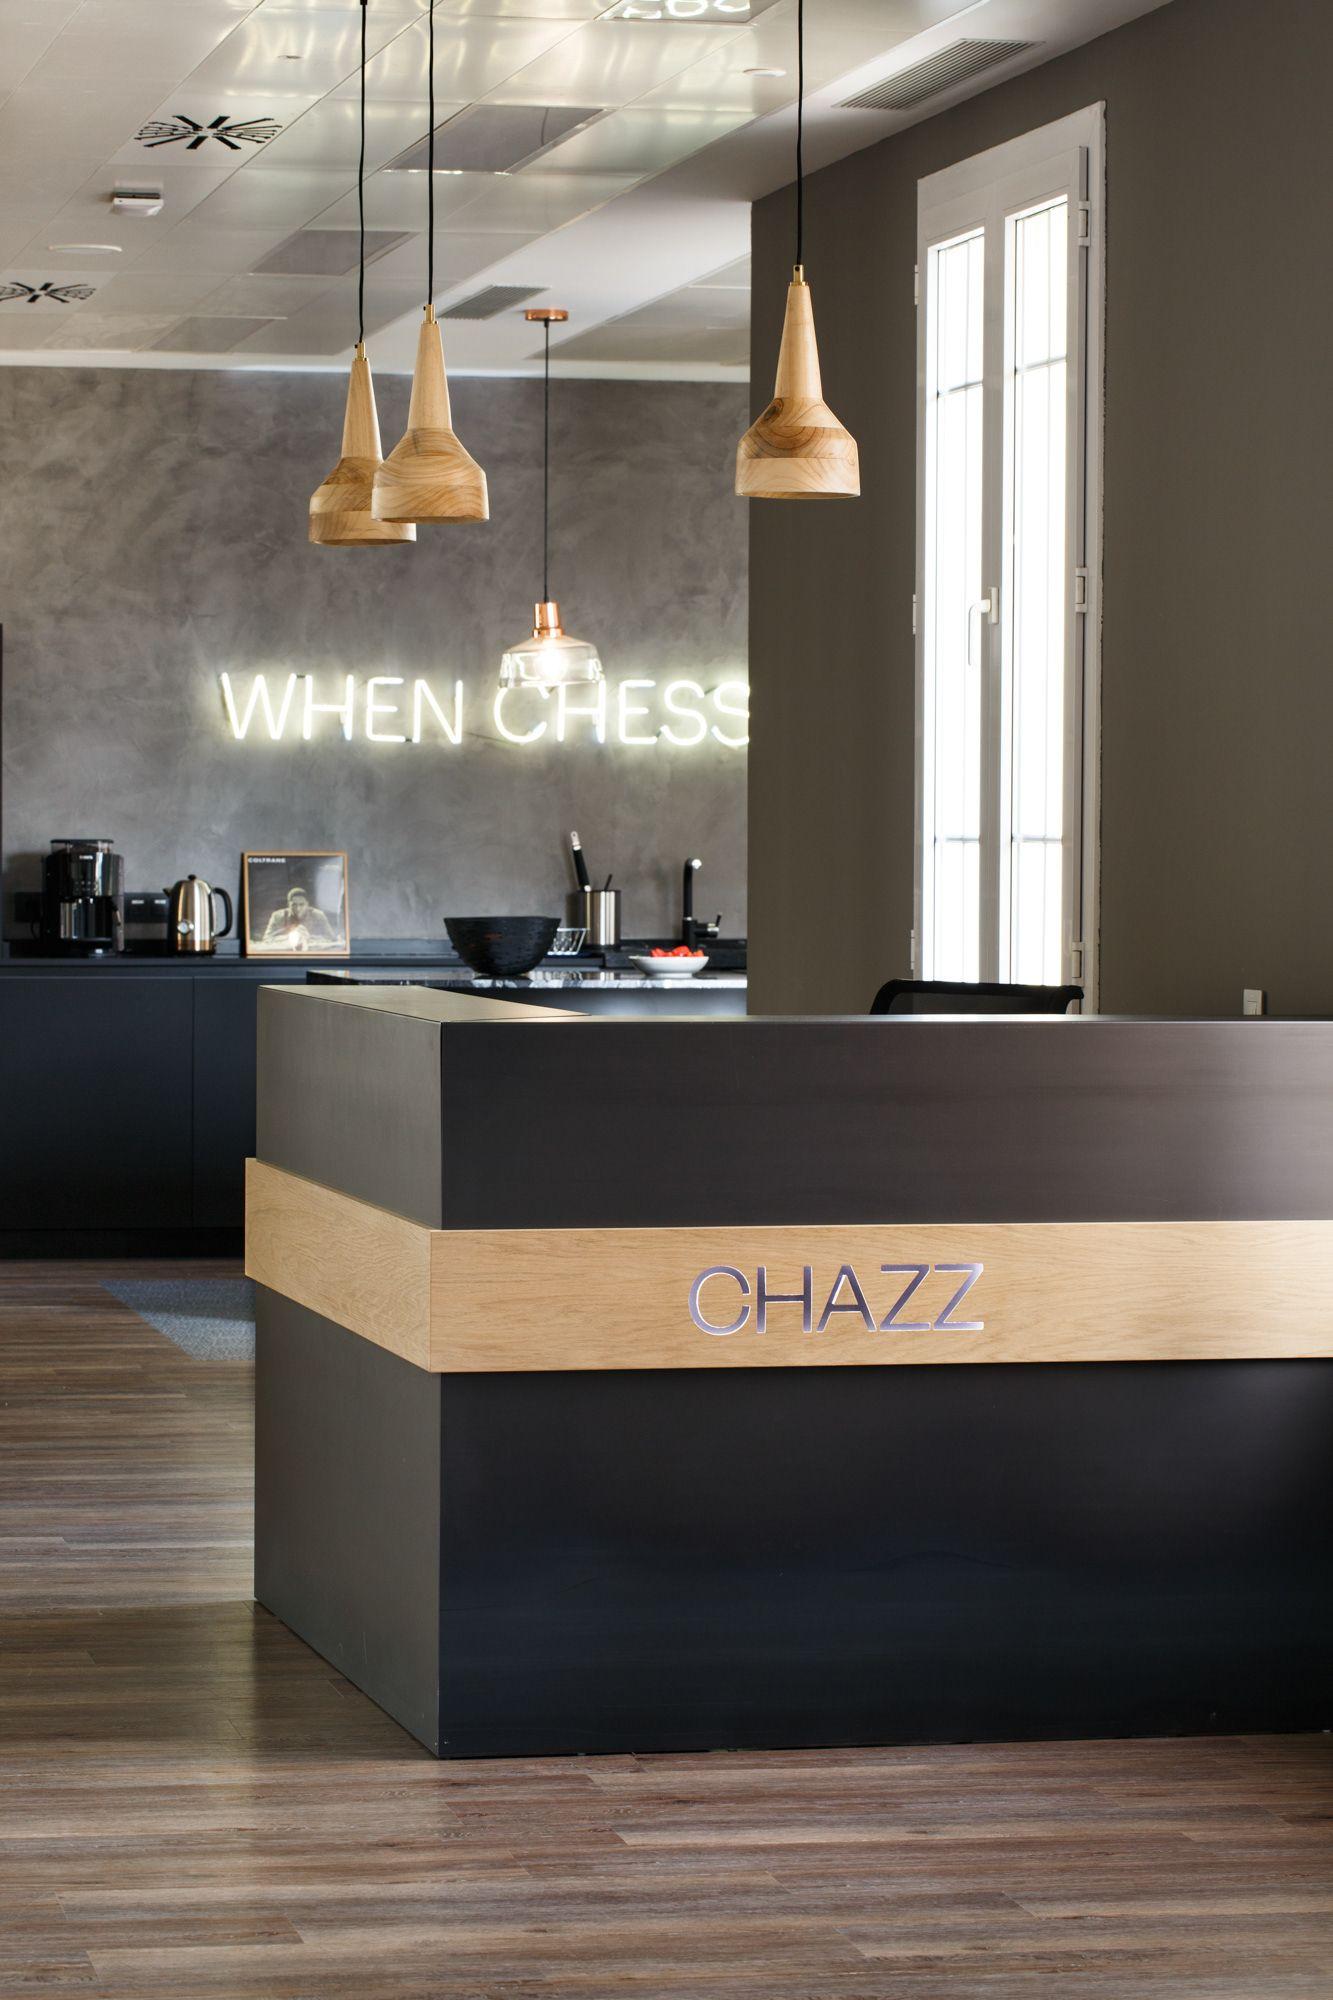 Chazz Office Interior Design On Behance Office Interior Design